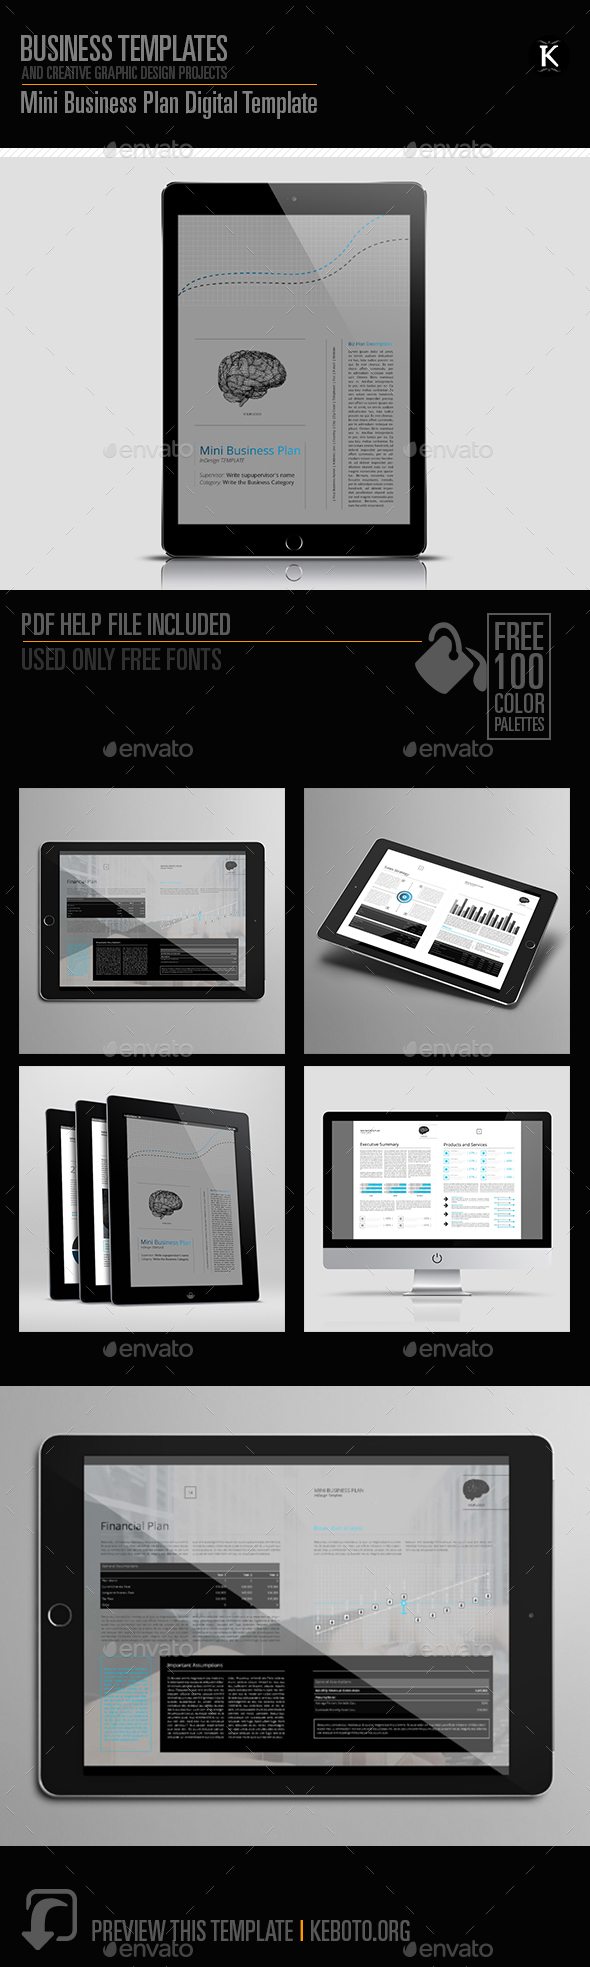 Mini Business Plan Digital Template - ePublishing